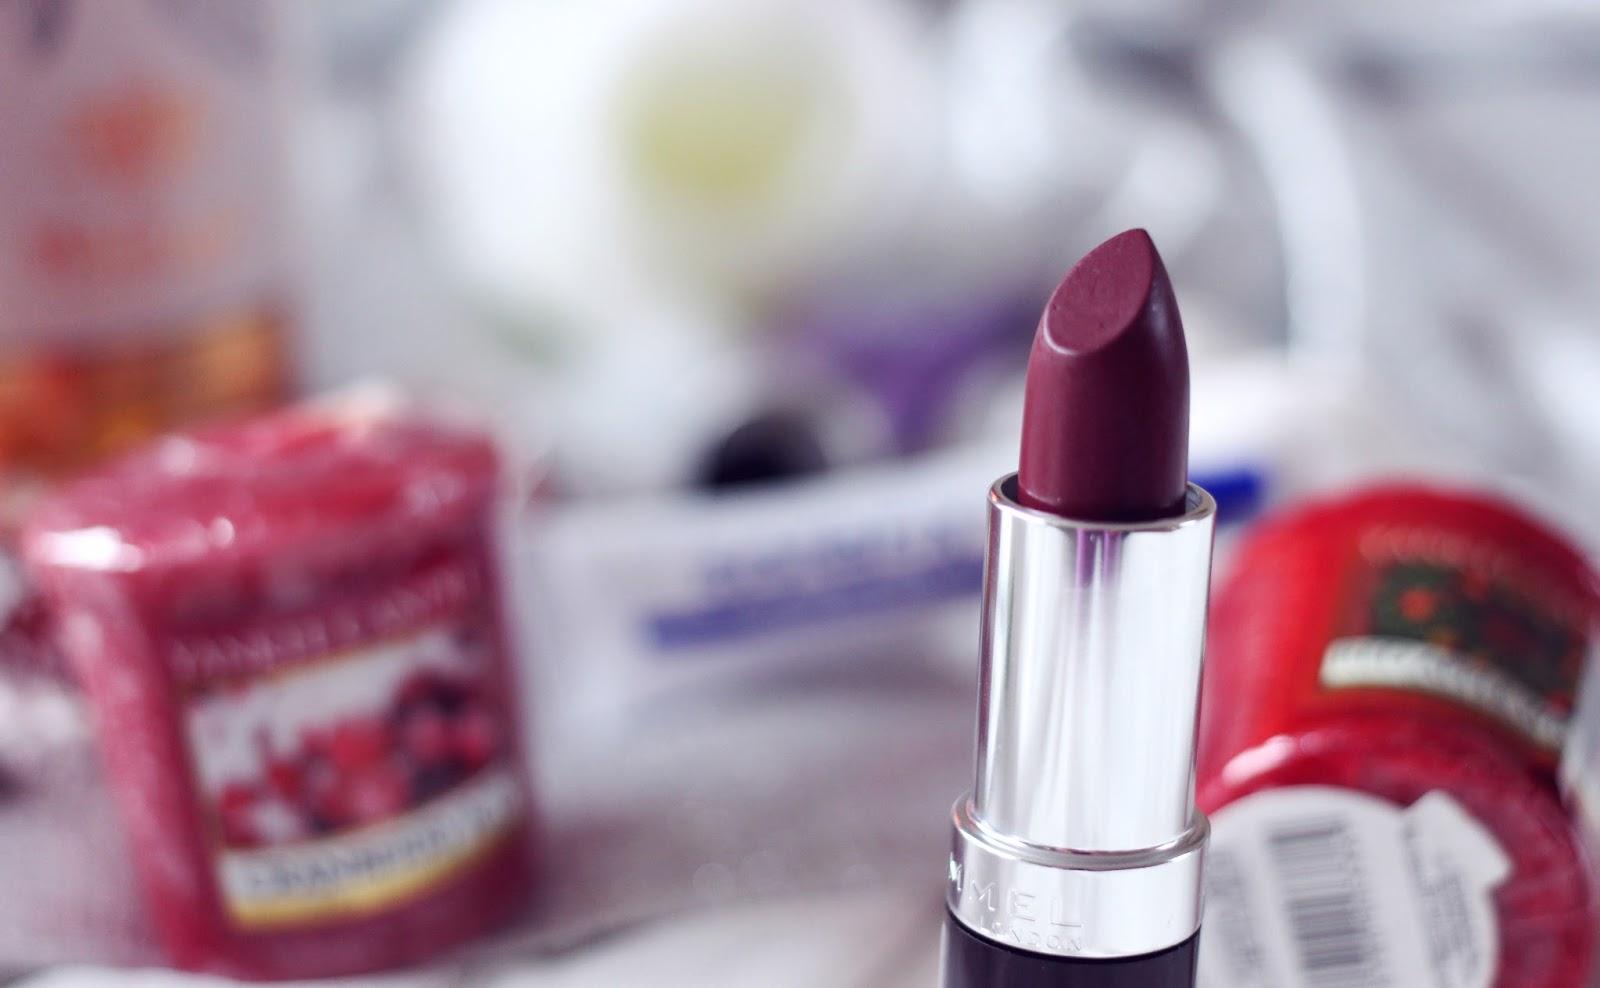 Rimmel Starry Eyed Lipstick